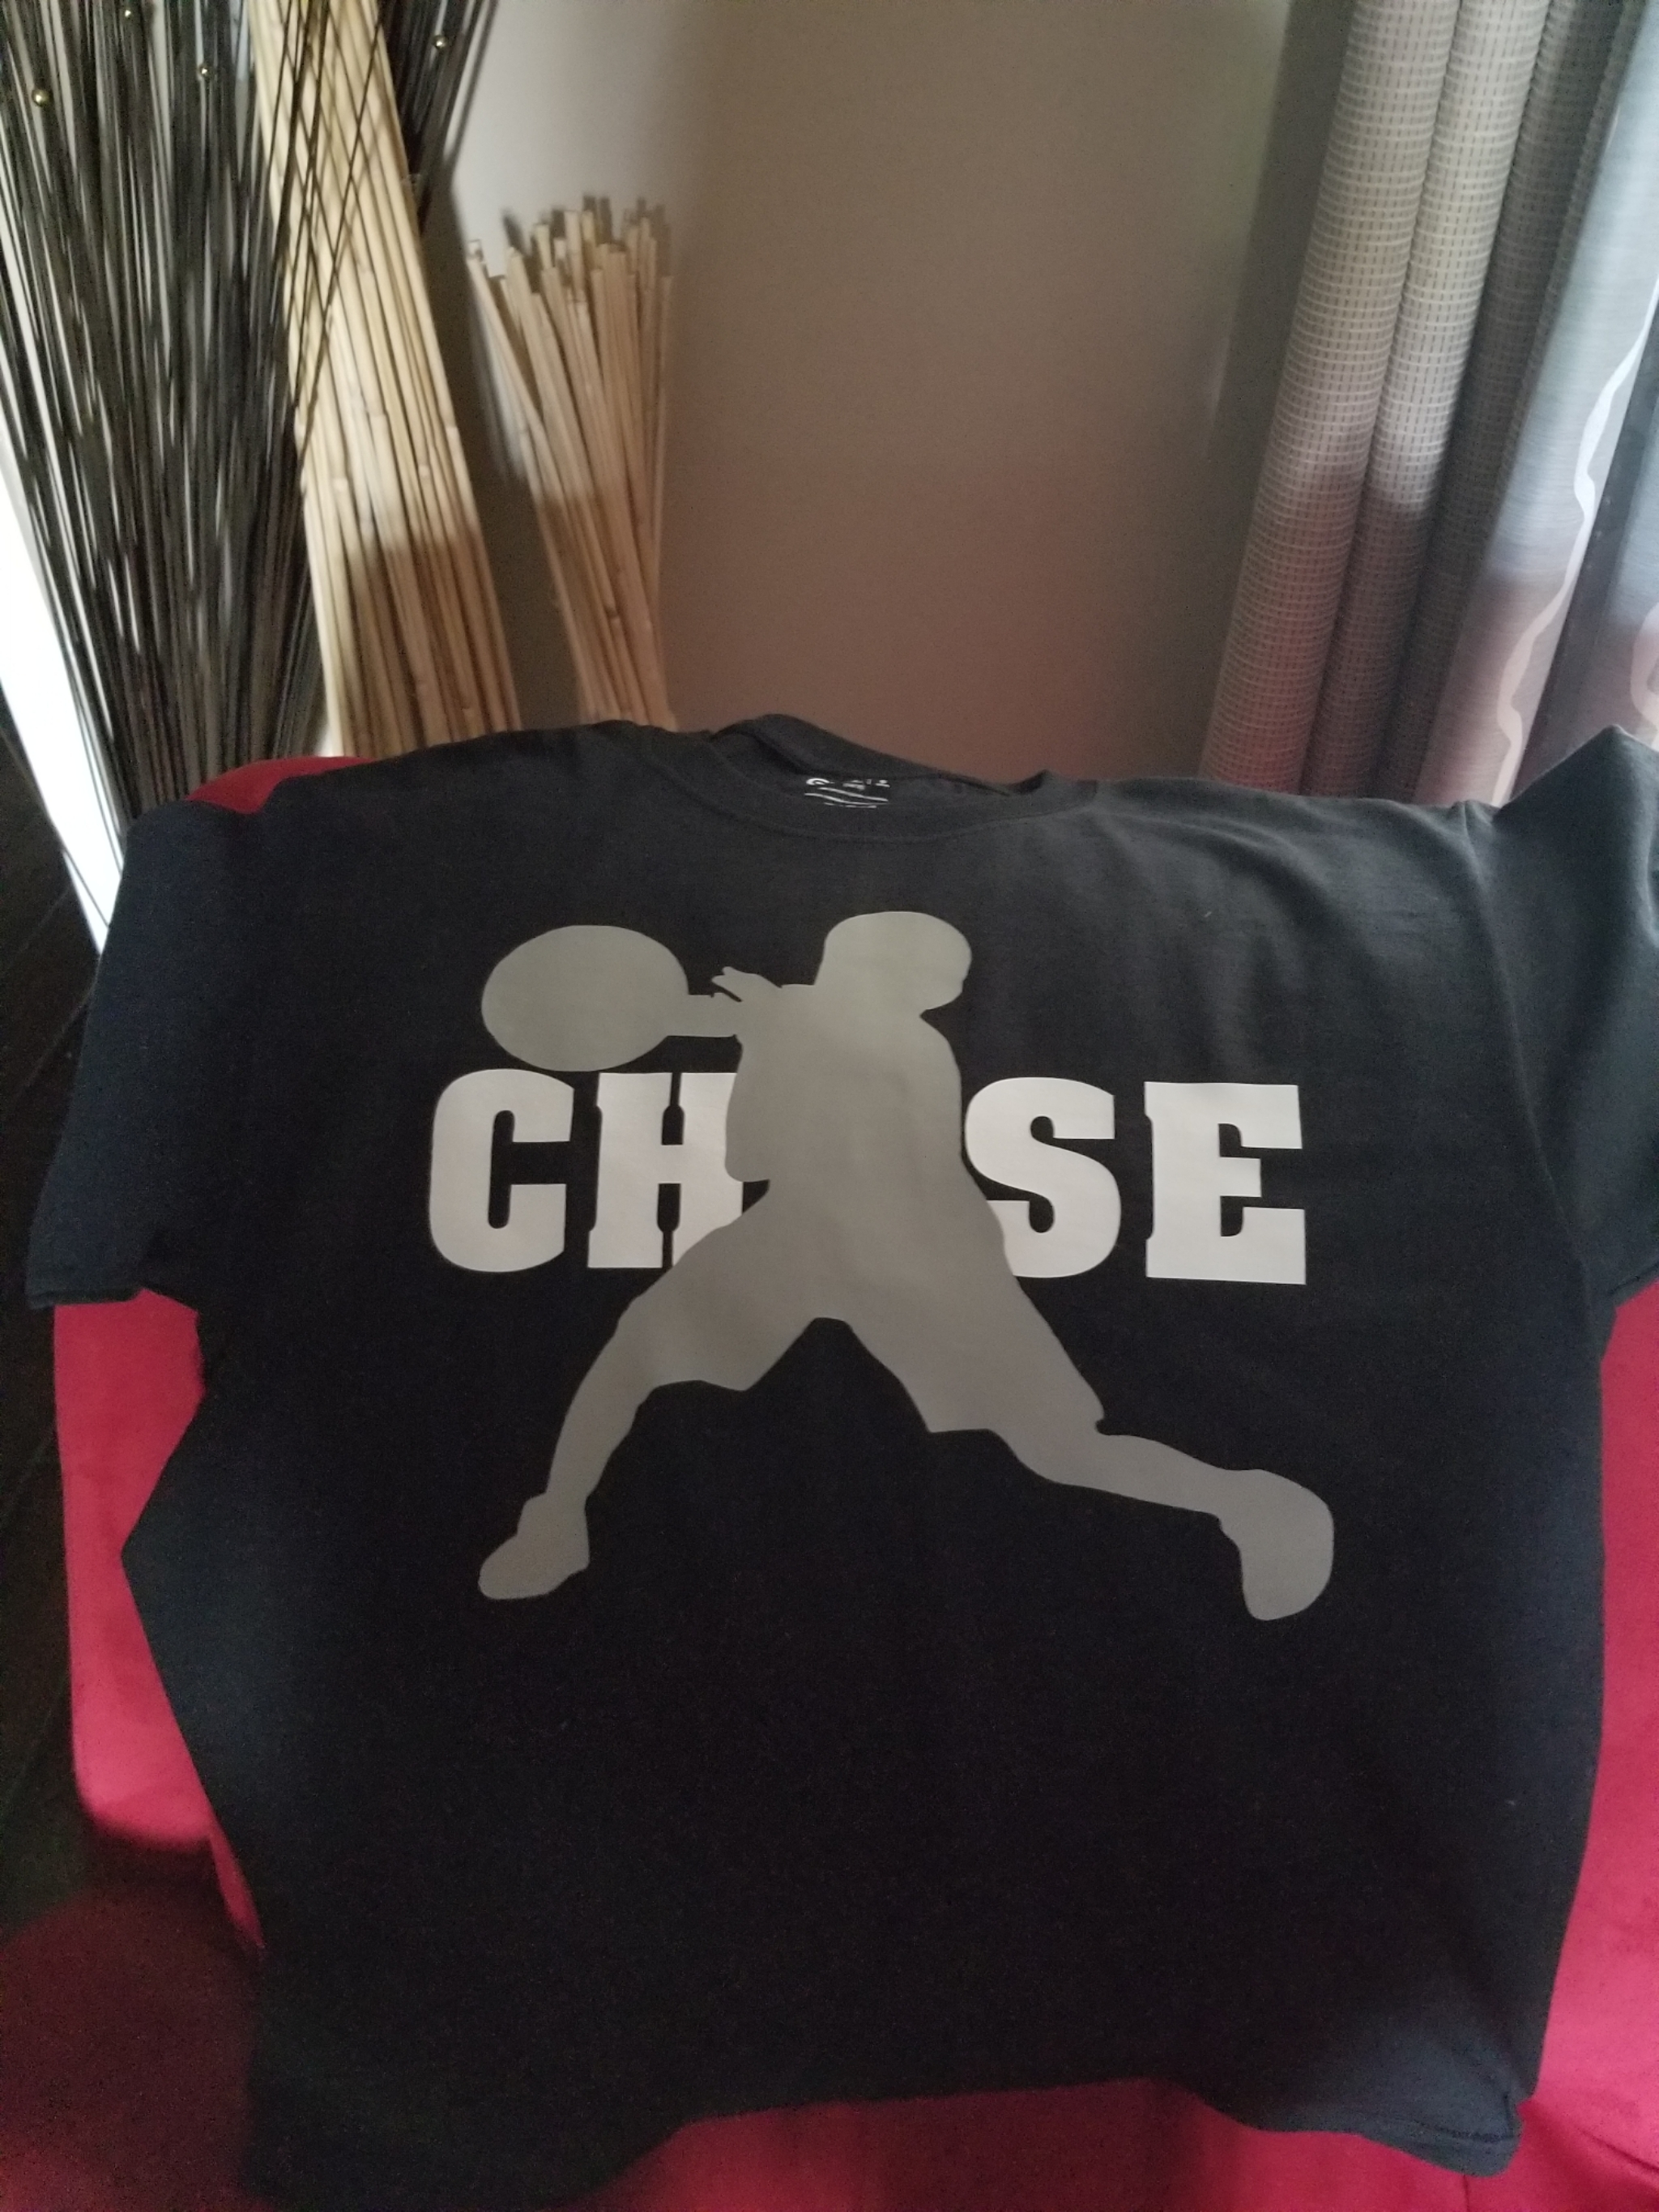 CHASE T-shirt 00014